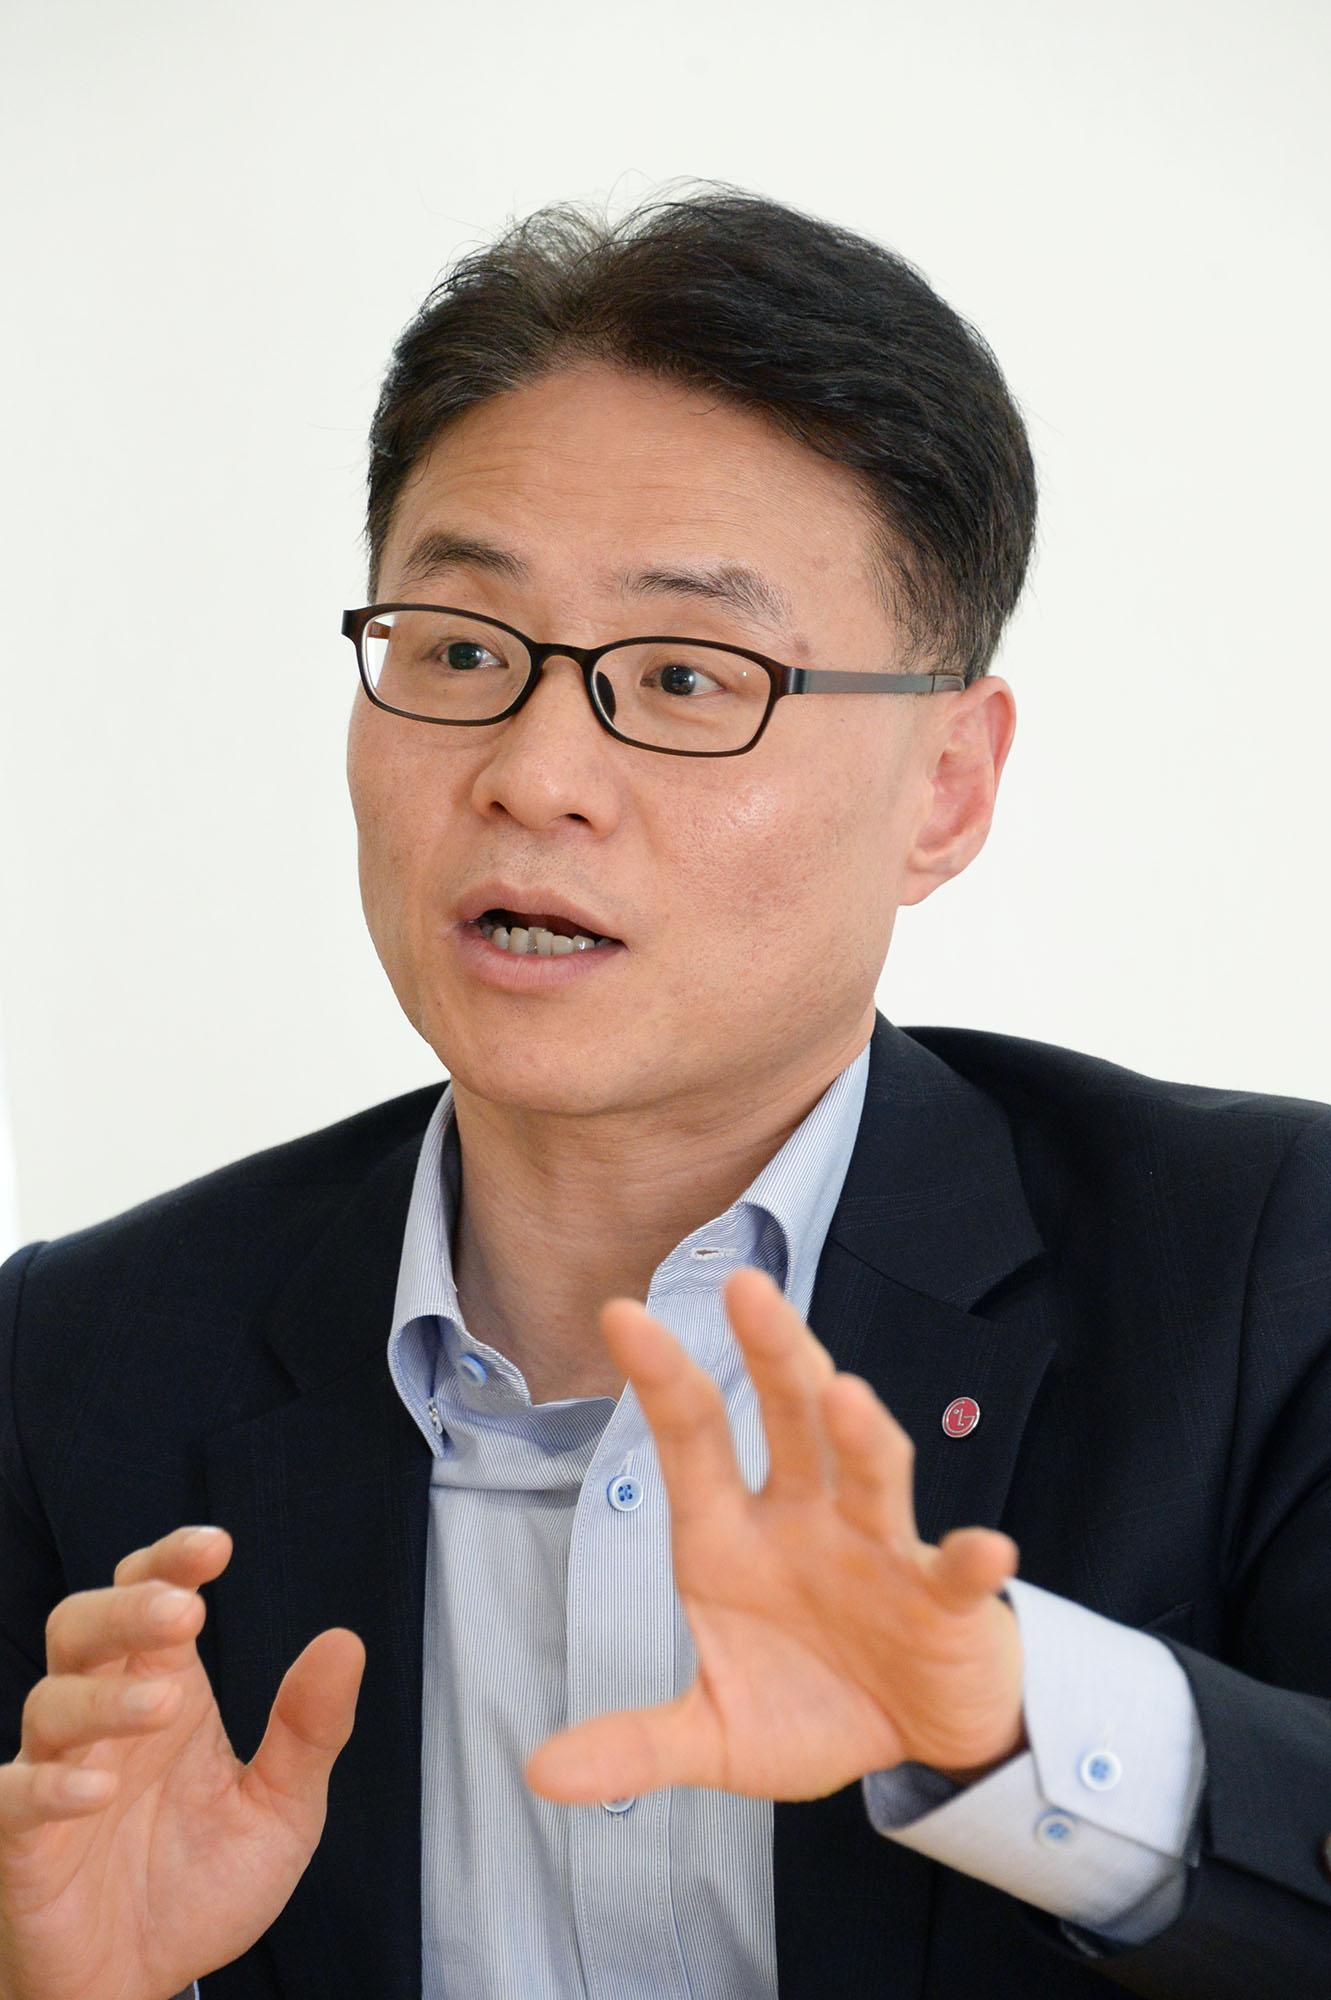 LG전자 MC사업본부 마케팅커뮤니케이션담당 이철훈 상무